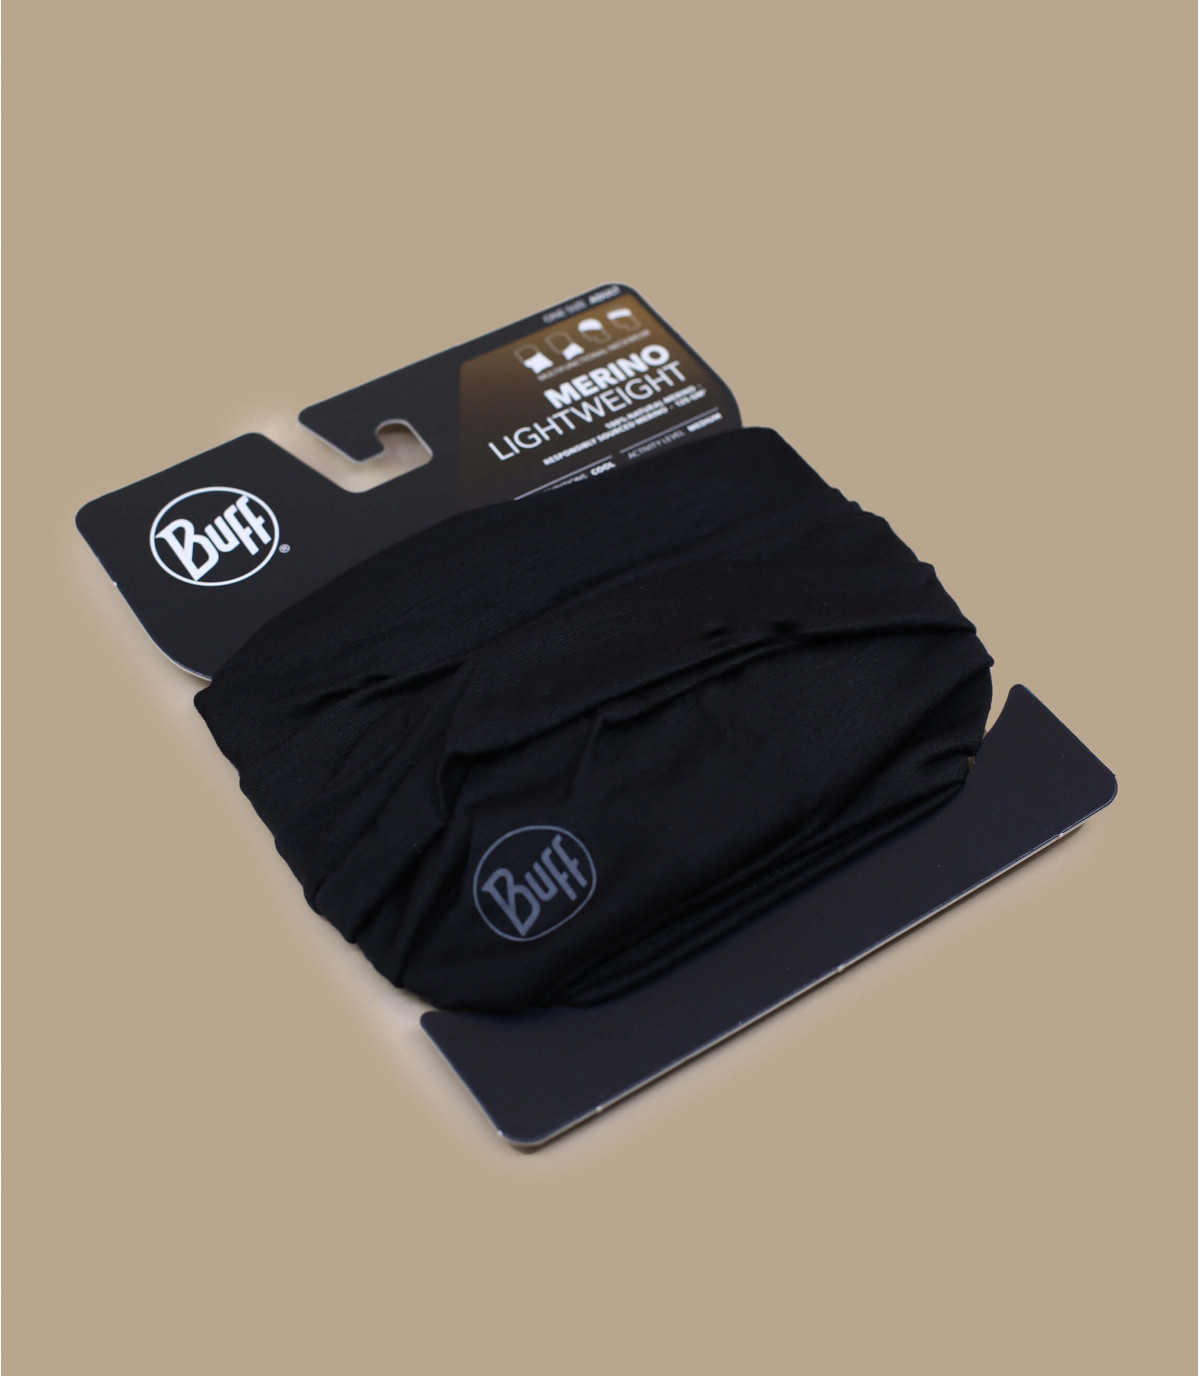 Details Lightweight Merino Wool solid black - afbeeling 2